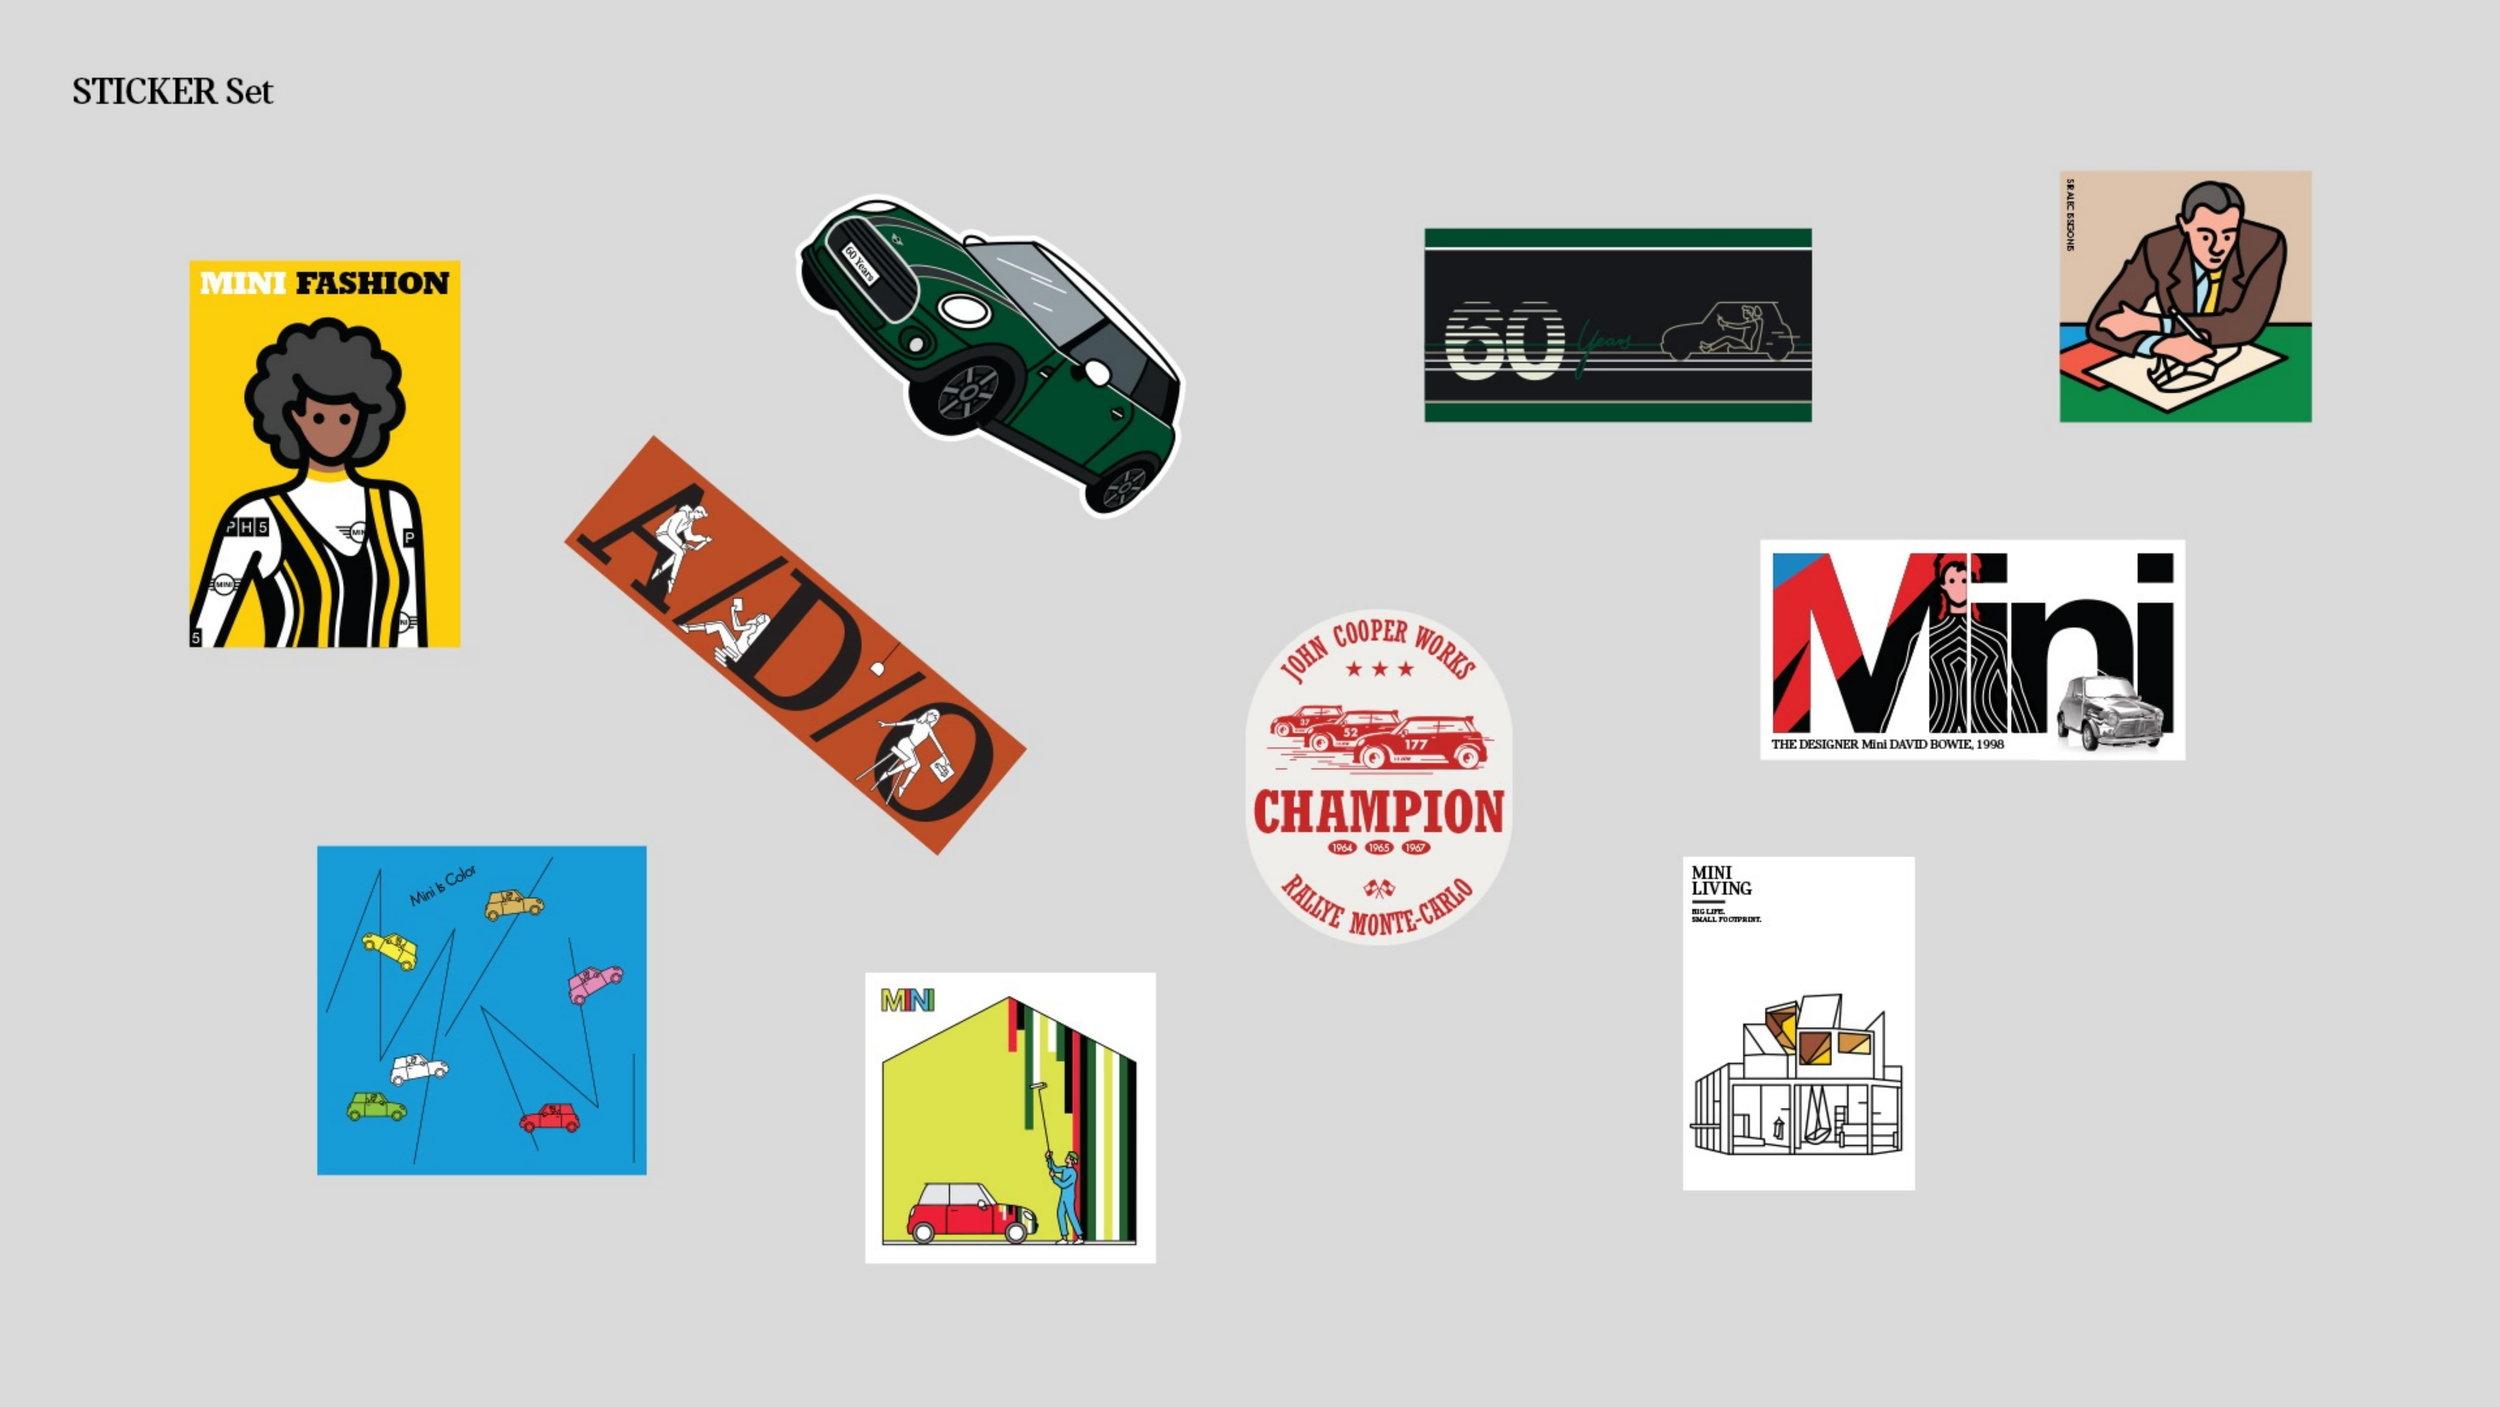 - mini 60 years of inspiration sticker set